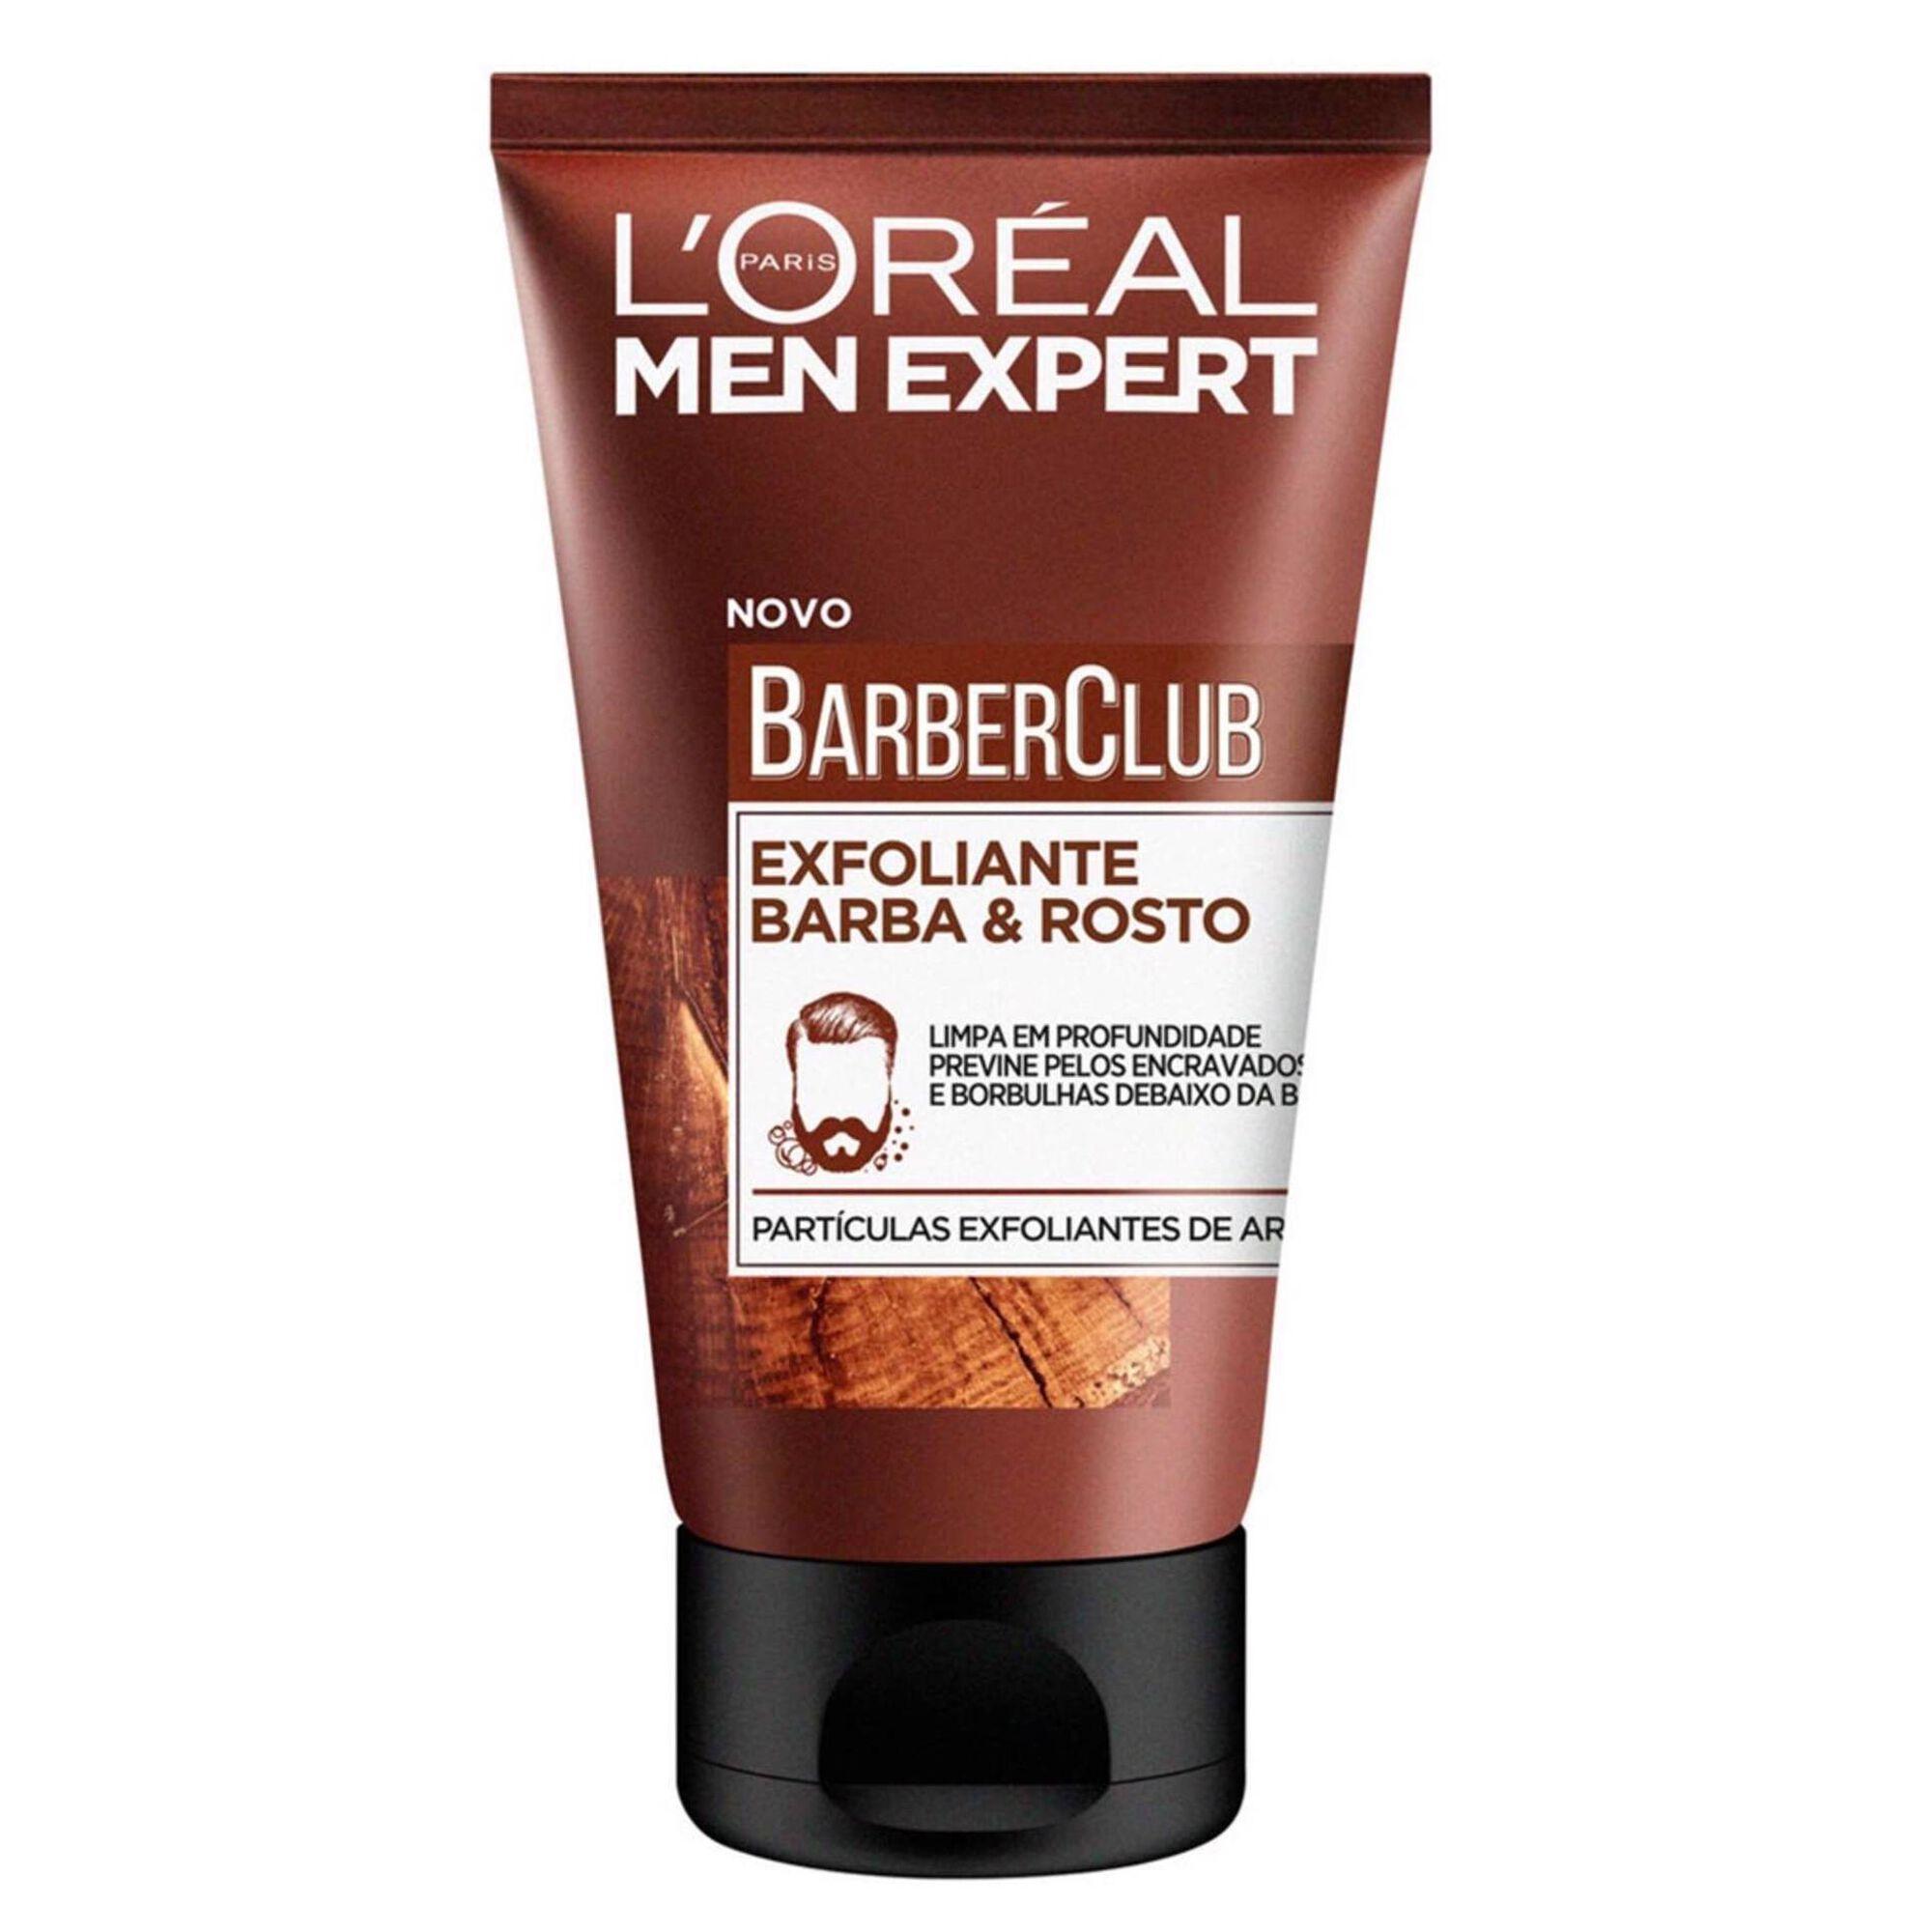 Exfoliante Barba e Rosto Men Expert Barber Club